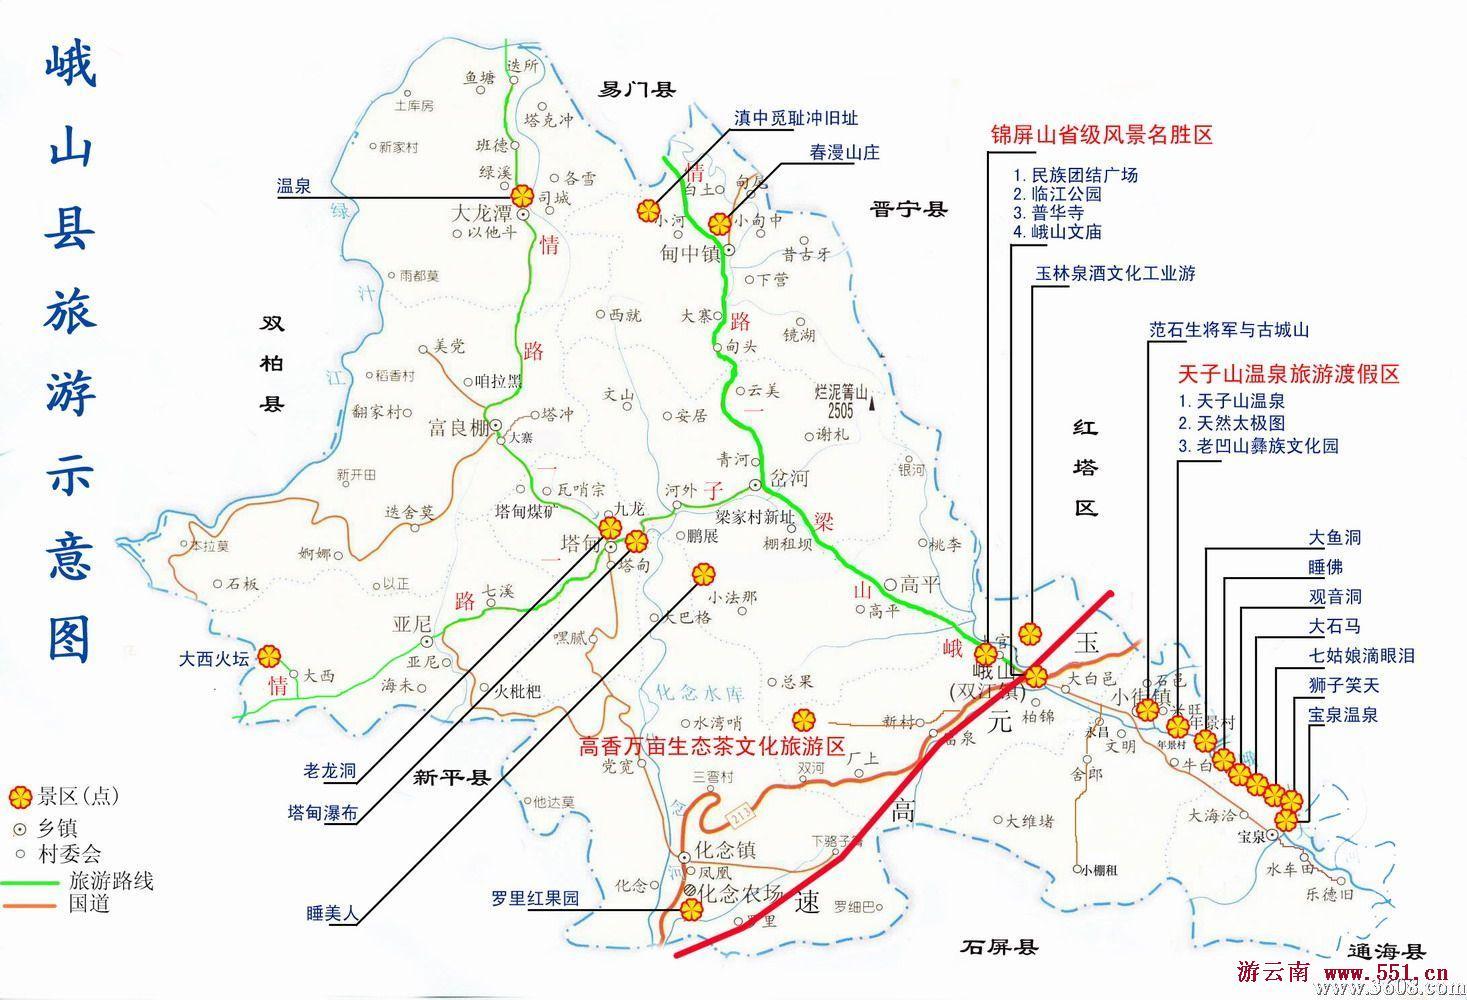 com 云南是著名的旅游大省,昆明,大理,丽江,香格里拉,西双版纳,腾冲